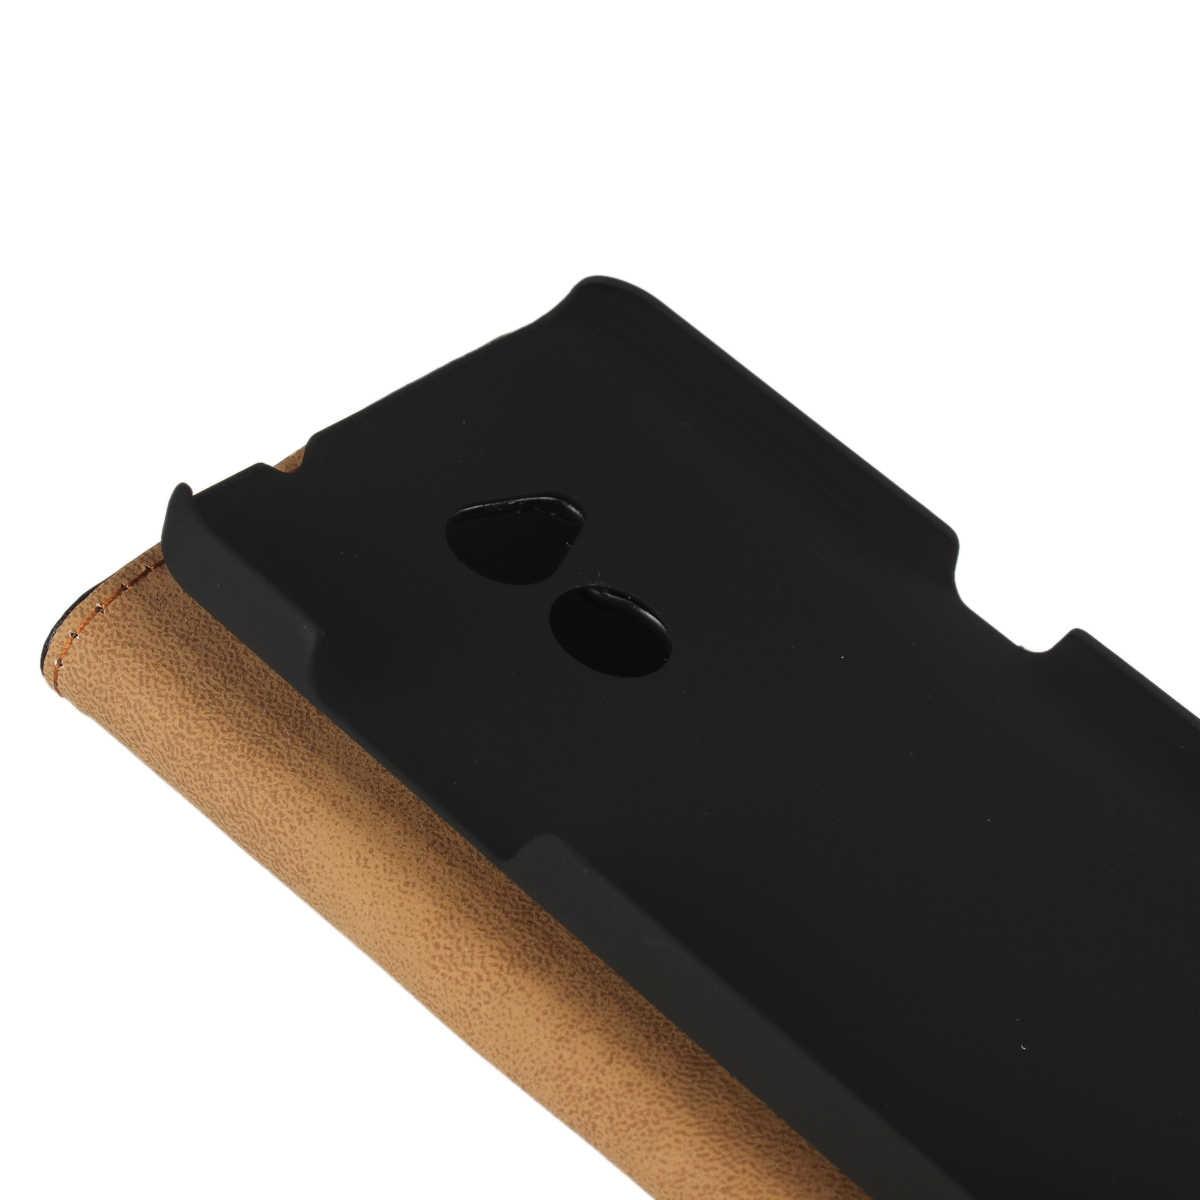 Premium Leder Flip-Cover Luxus Brieftasche Telefon fall Für ZTE Blade V7 Lite karte halter holster telefon shell GG